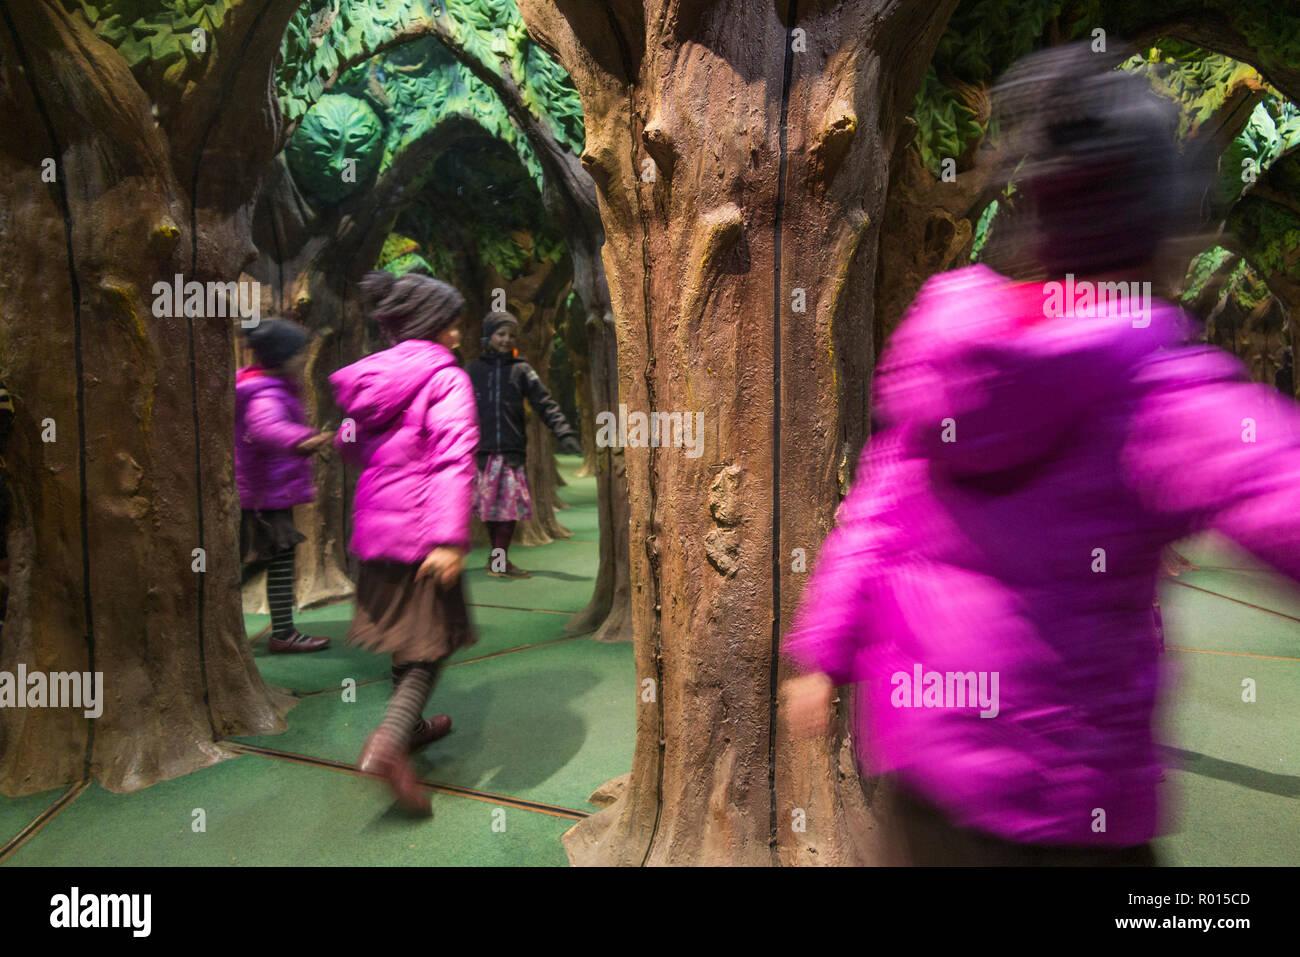 King Arthur's Mirror Maze with exploring children / kids / kids at Longleat Safari Park, Wiltshire. UK (103) - Stock Image